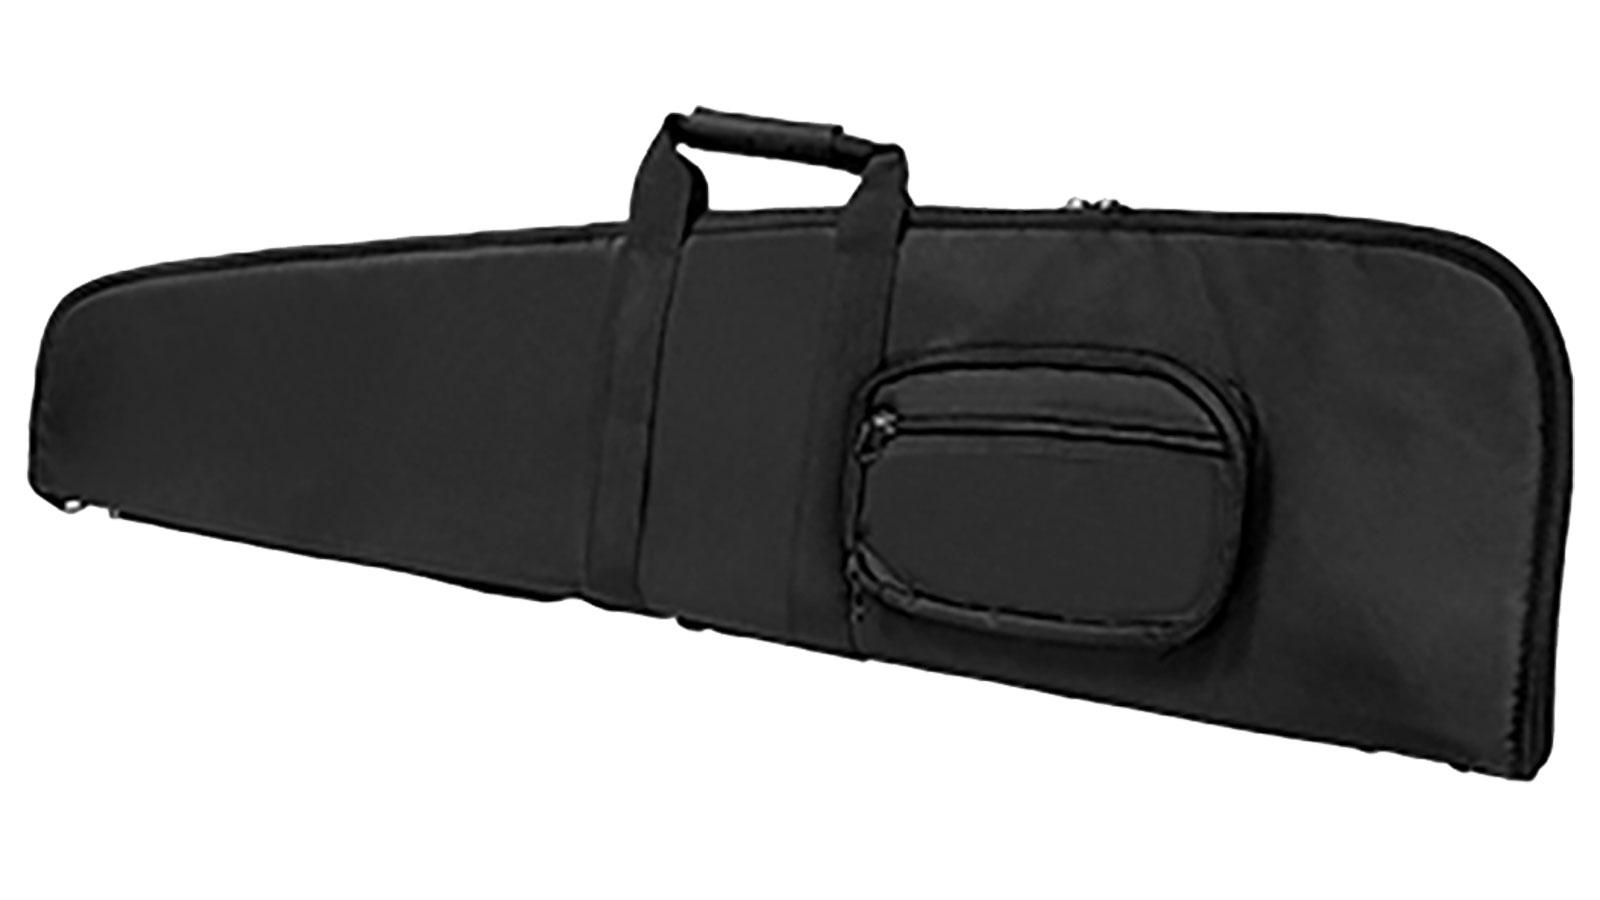 NCStar Case (48-inch L x 13-inch H)|Black